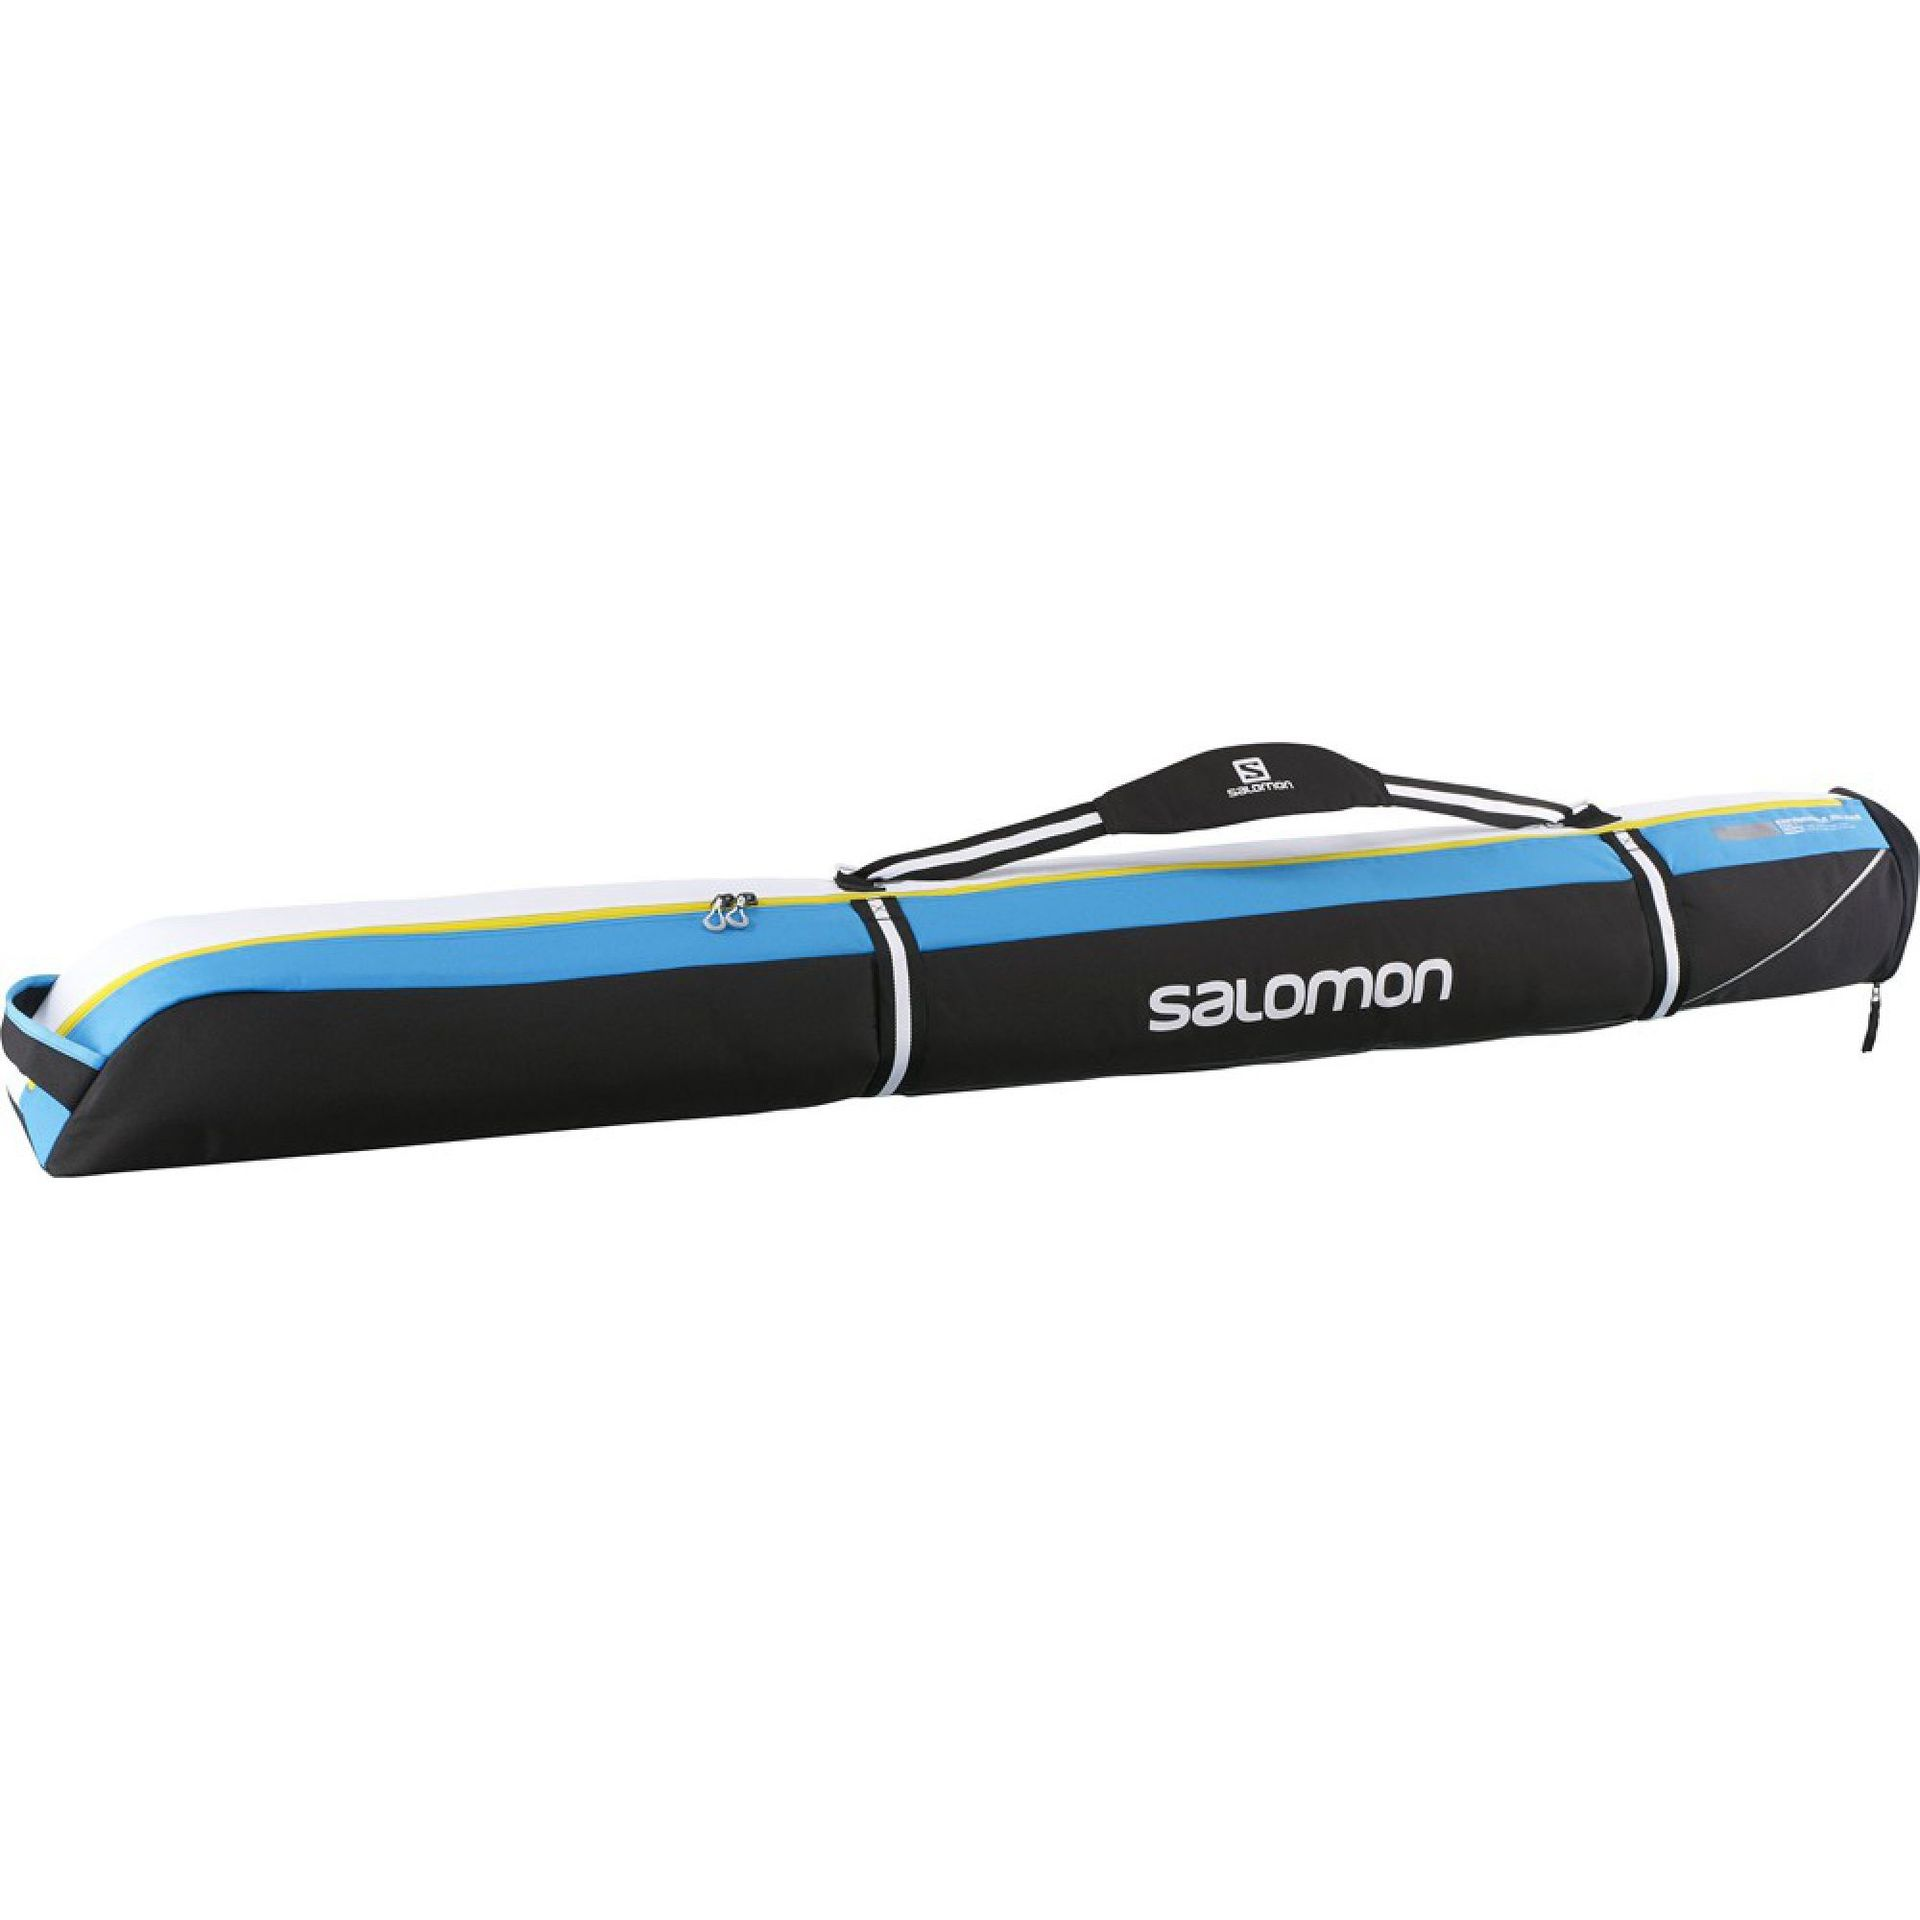 POKROWIEC NA NARTY SALOMON EXTEND 1 PAIR 165 20 PADDED SKIBAG BLACK BLUE